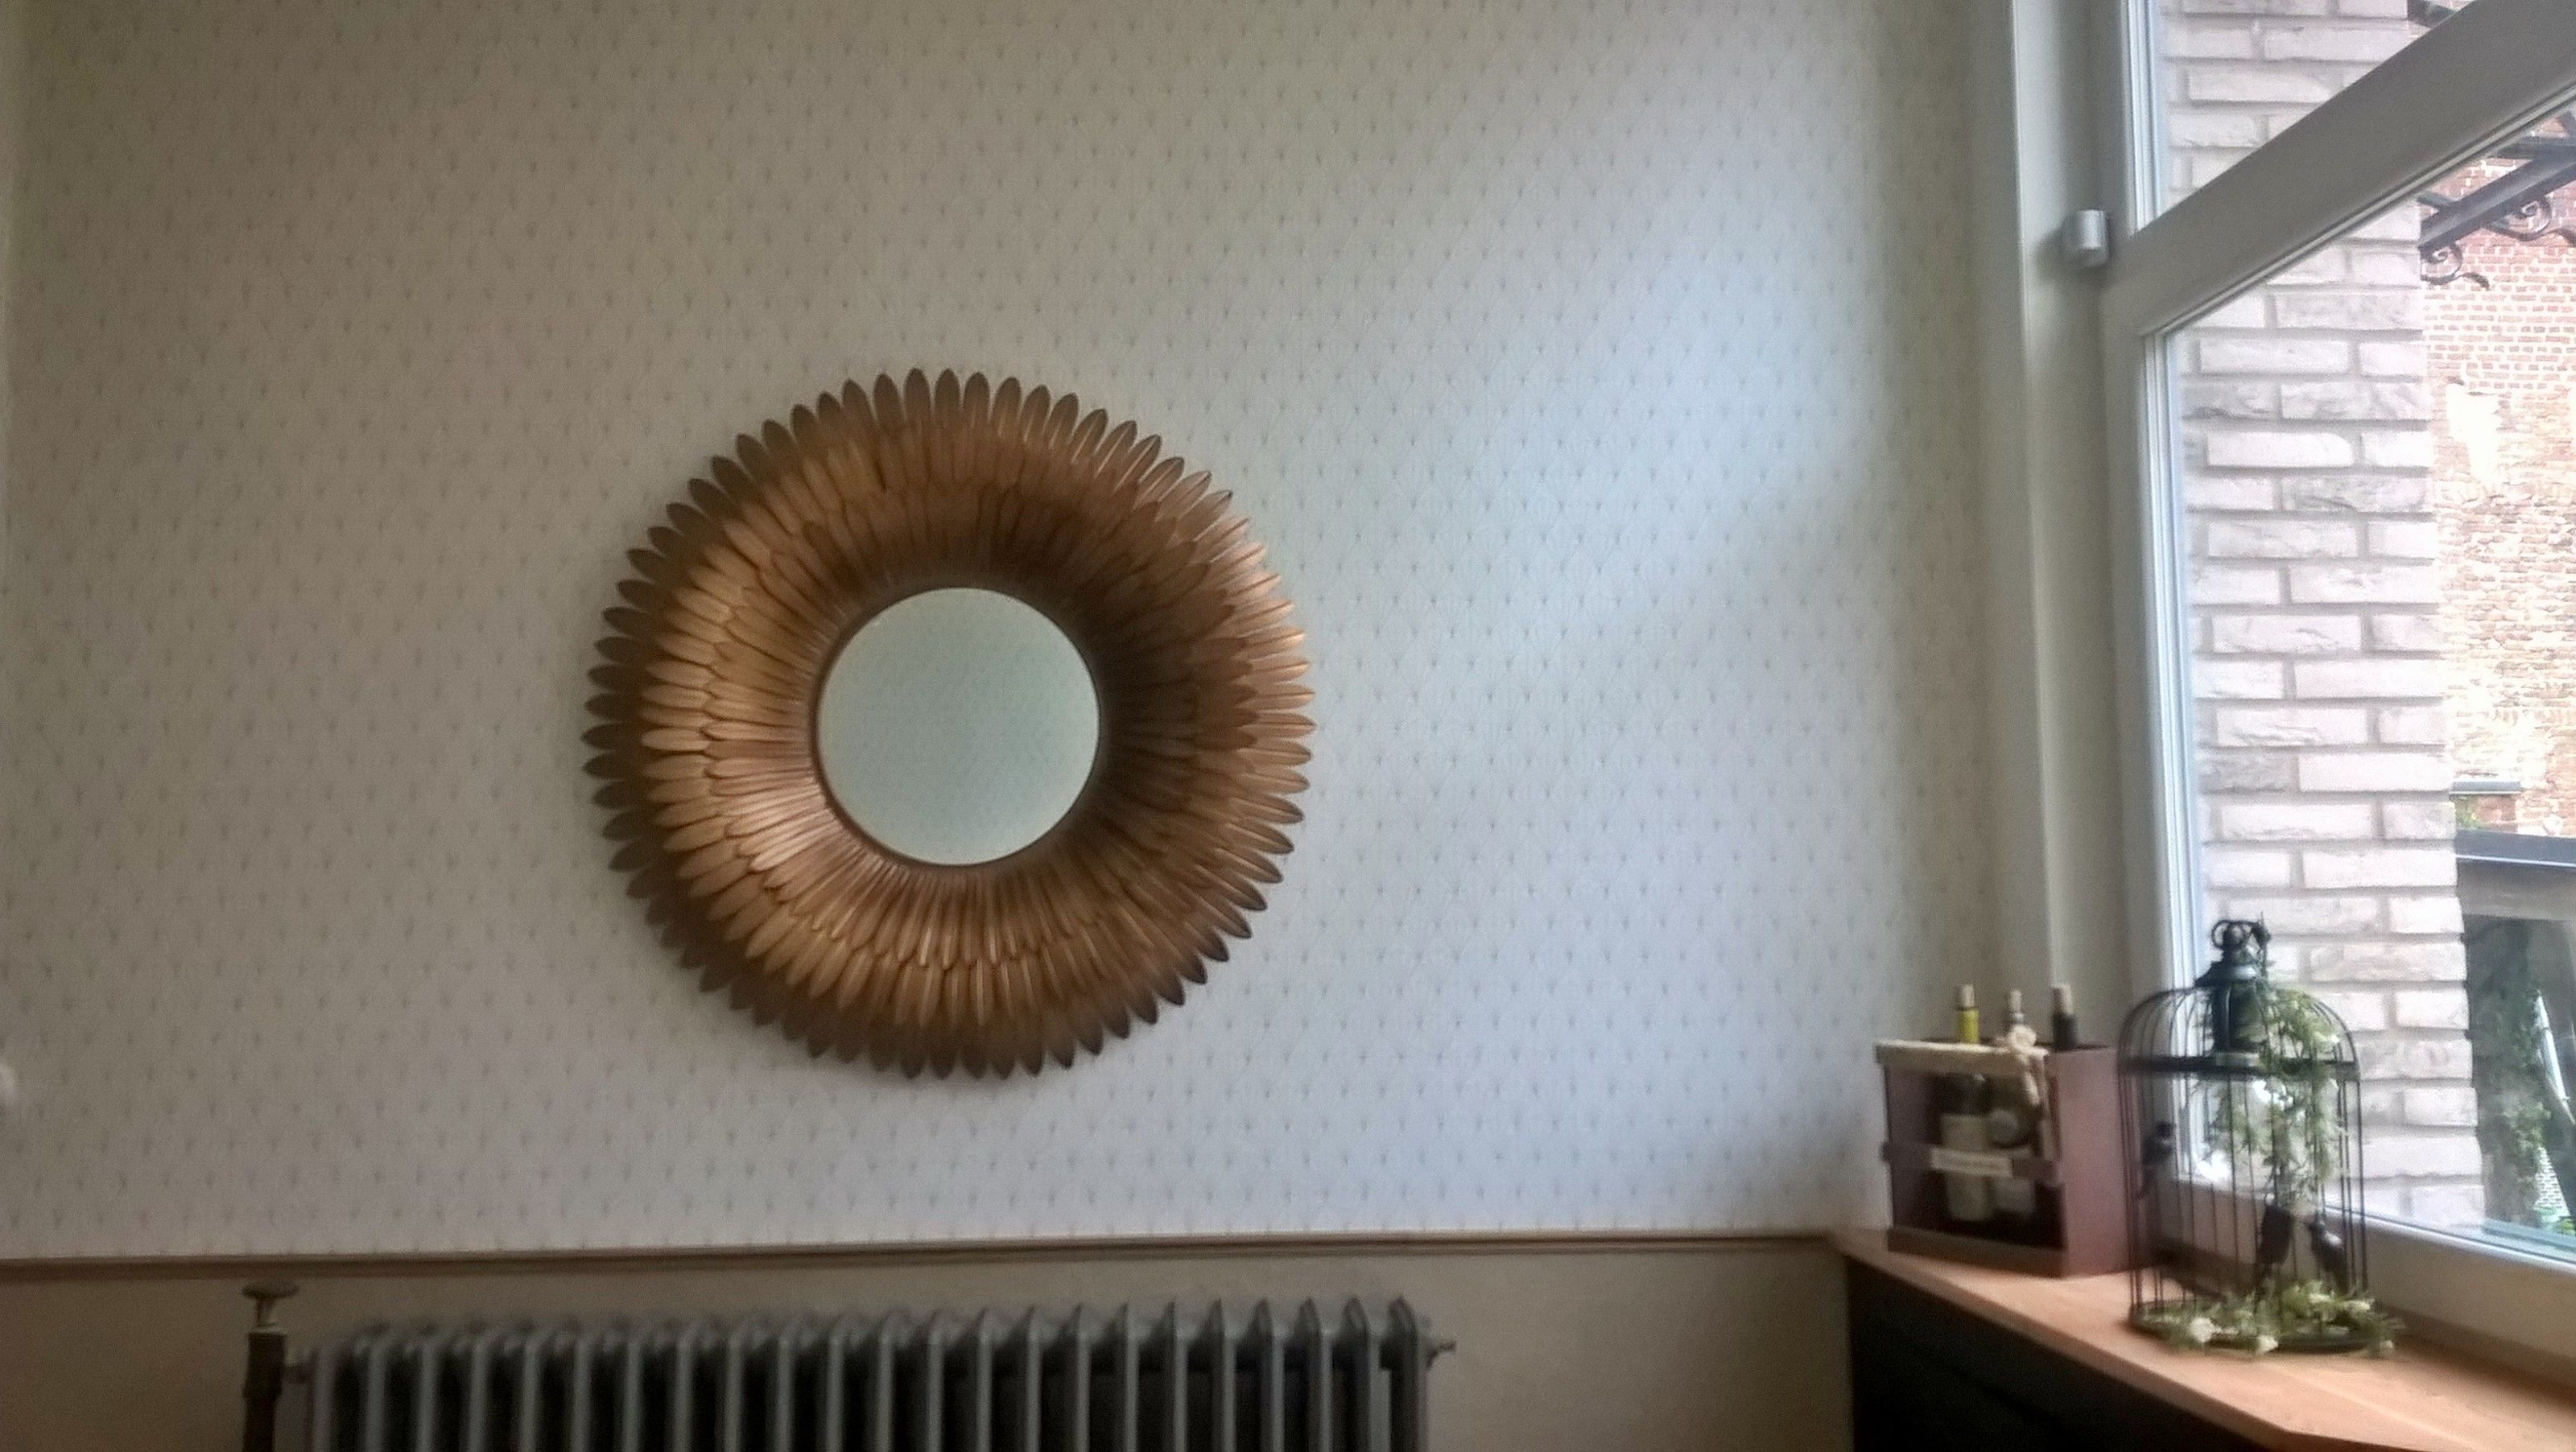 Papier Peint Effet Miroir miroir soleil tivoli (maisons du monde). papier peint effet